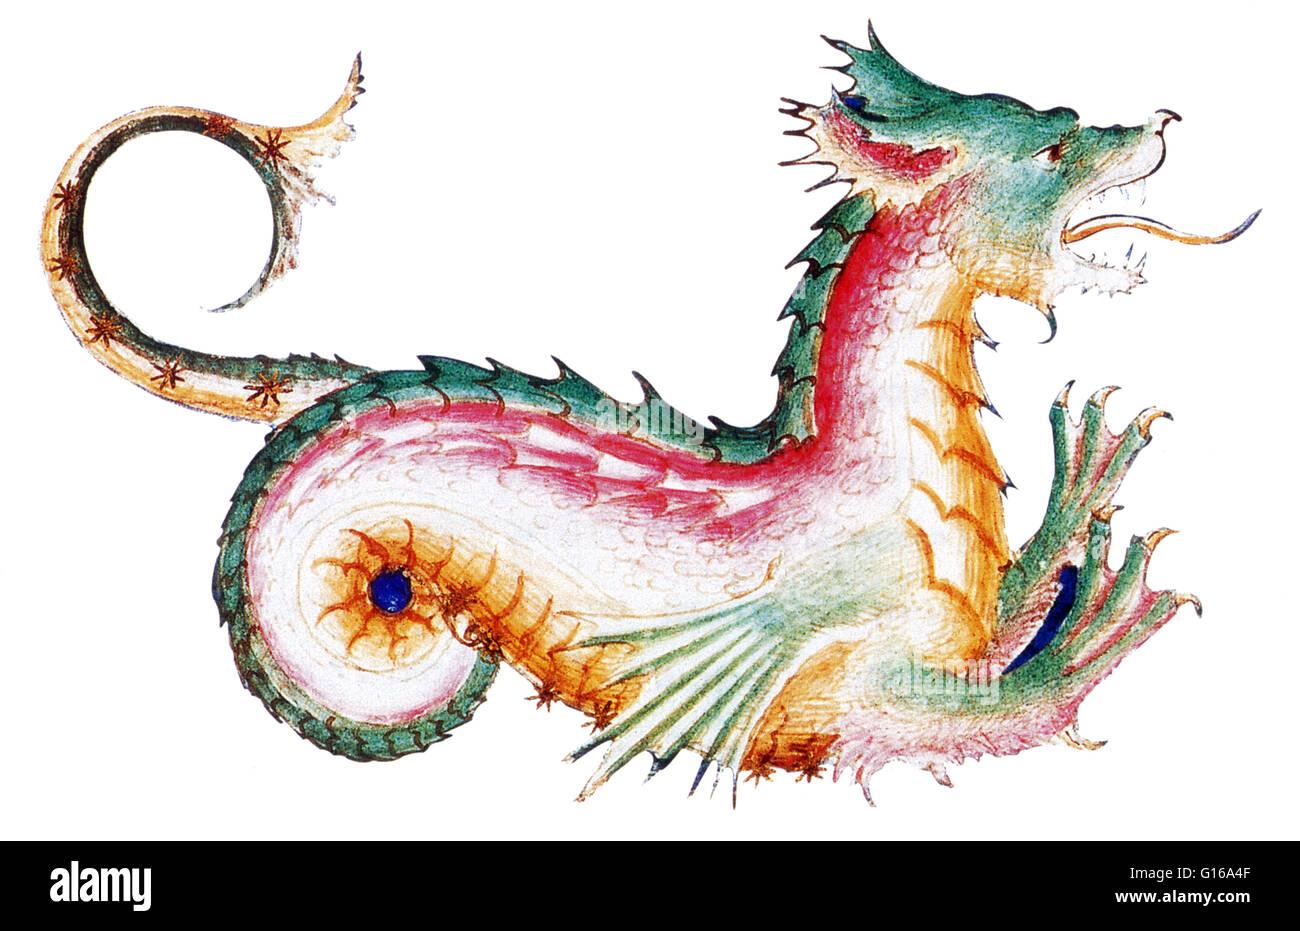 Rainbow colored dragon, perhaps the constellation Draco, illustrates a 15th century manuscript of De Sideribus Tractatus - Stock Image